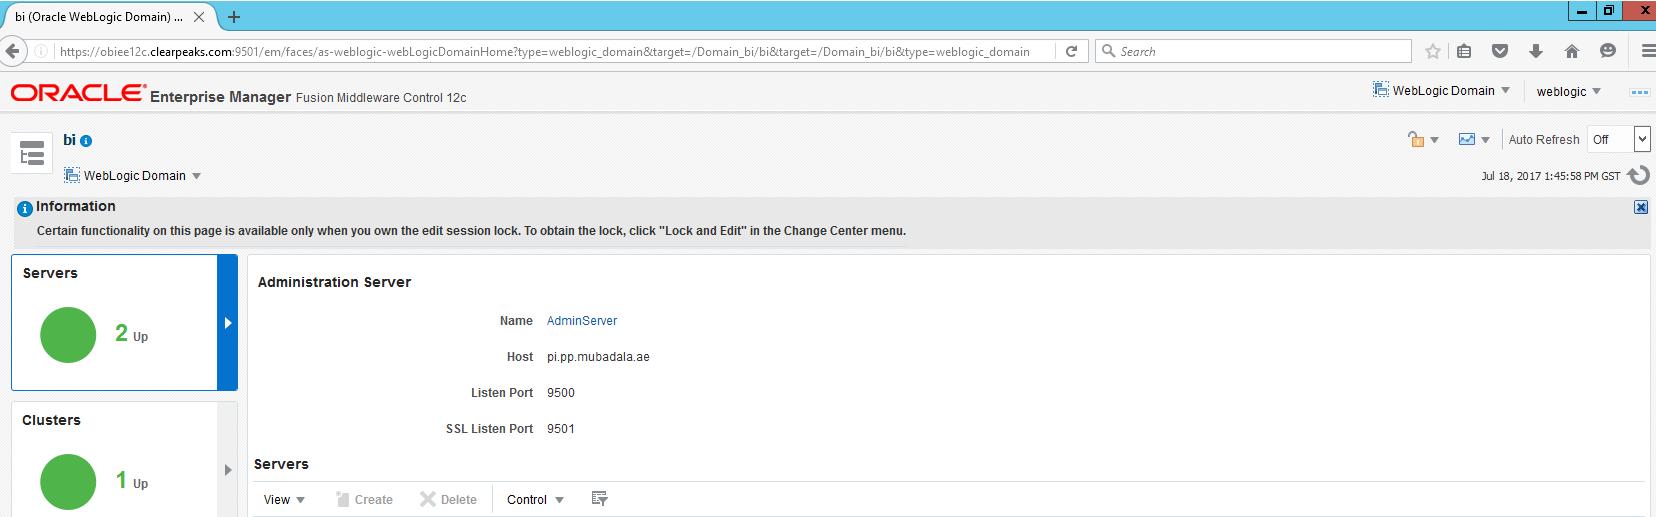 Configuring SSL for OBIEE 12C - ClearPeaks